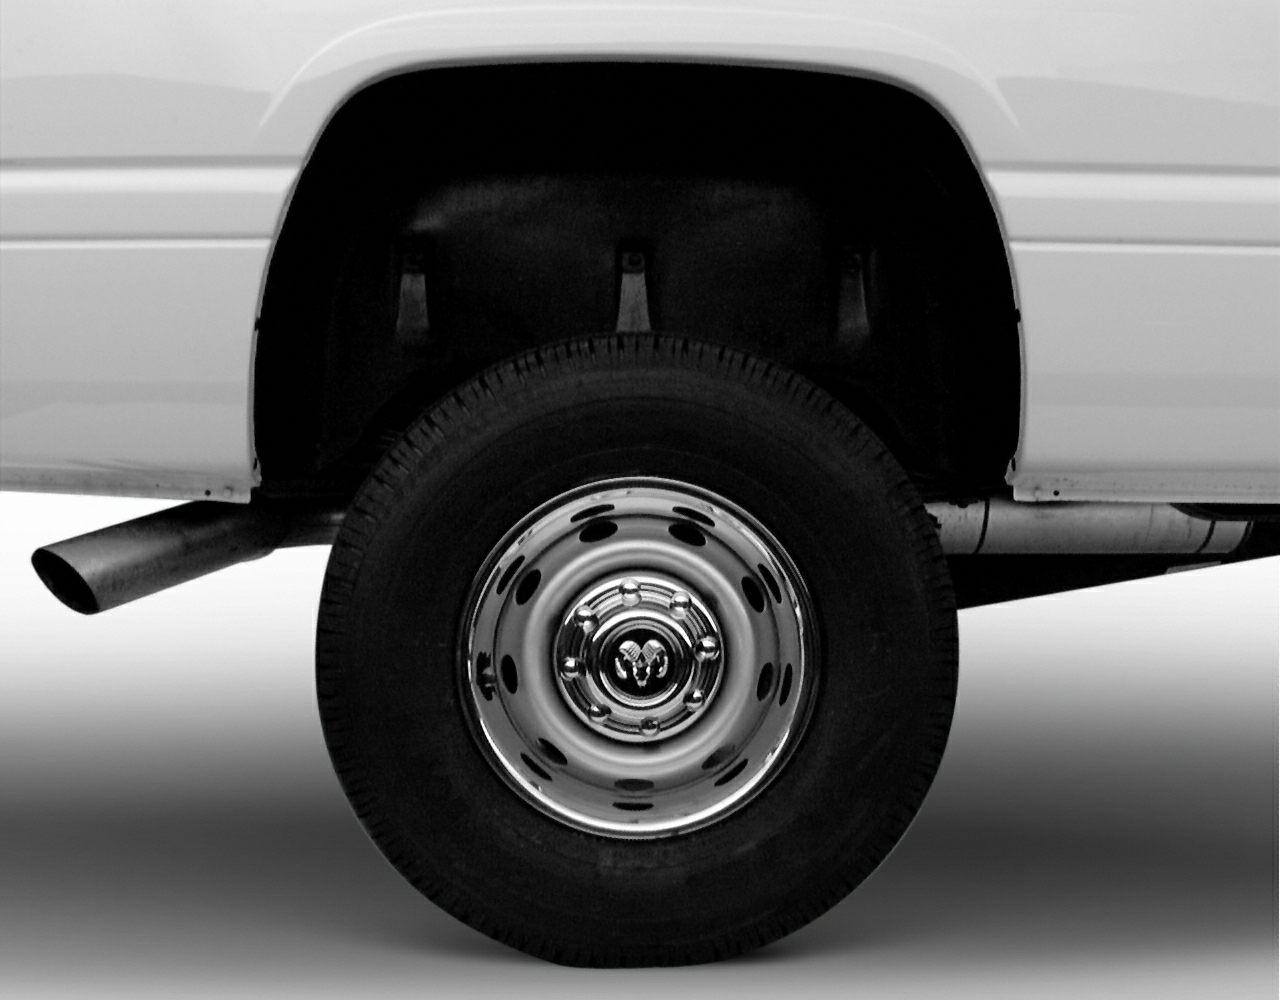 2000 Dodge Ram 2500 Exterior Photo